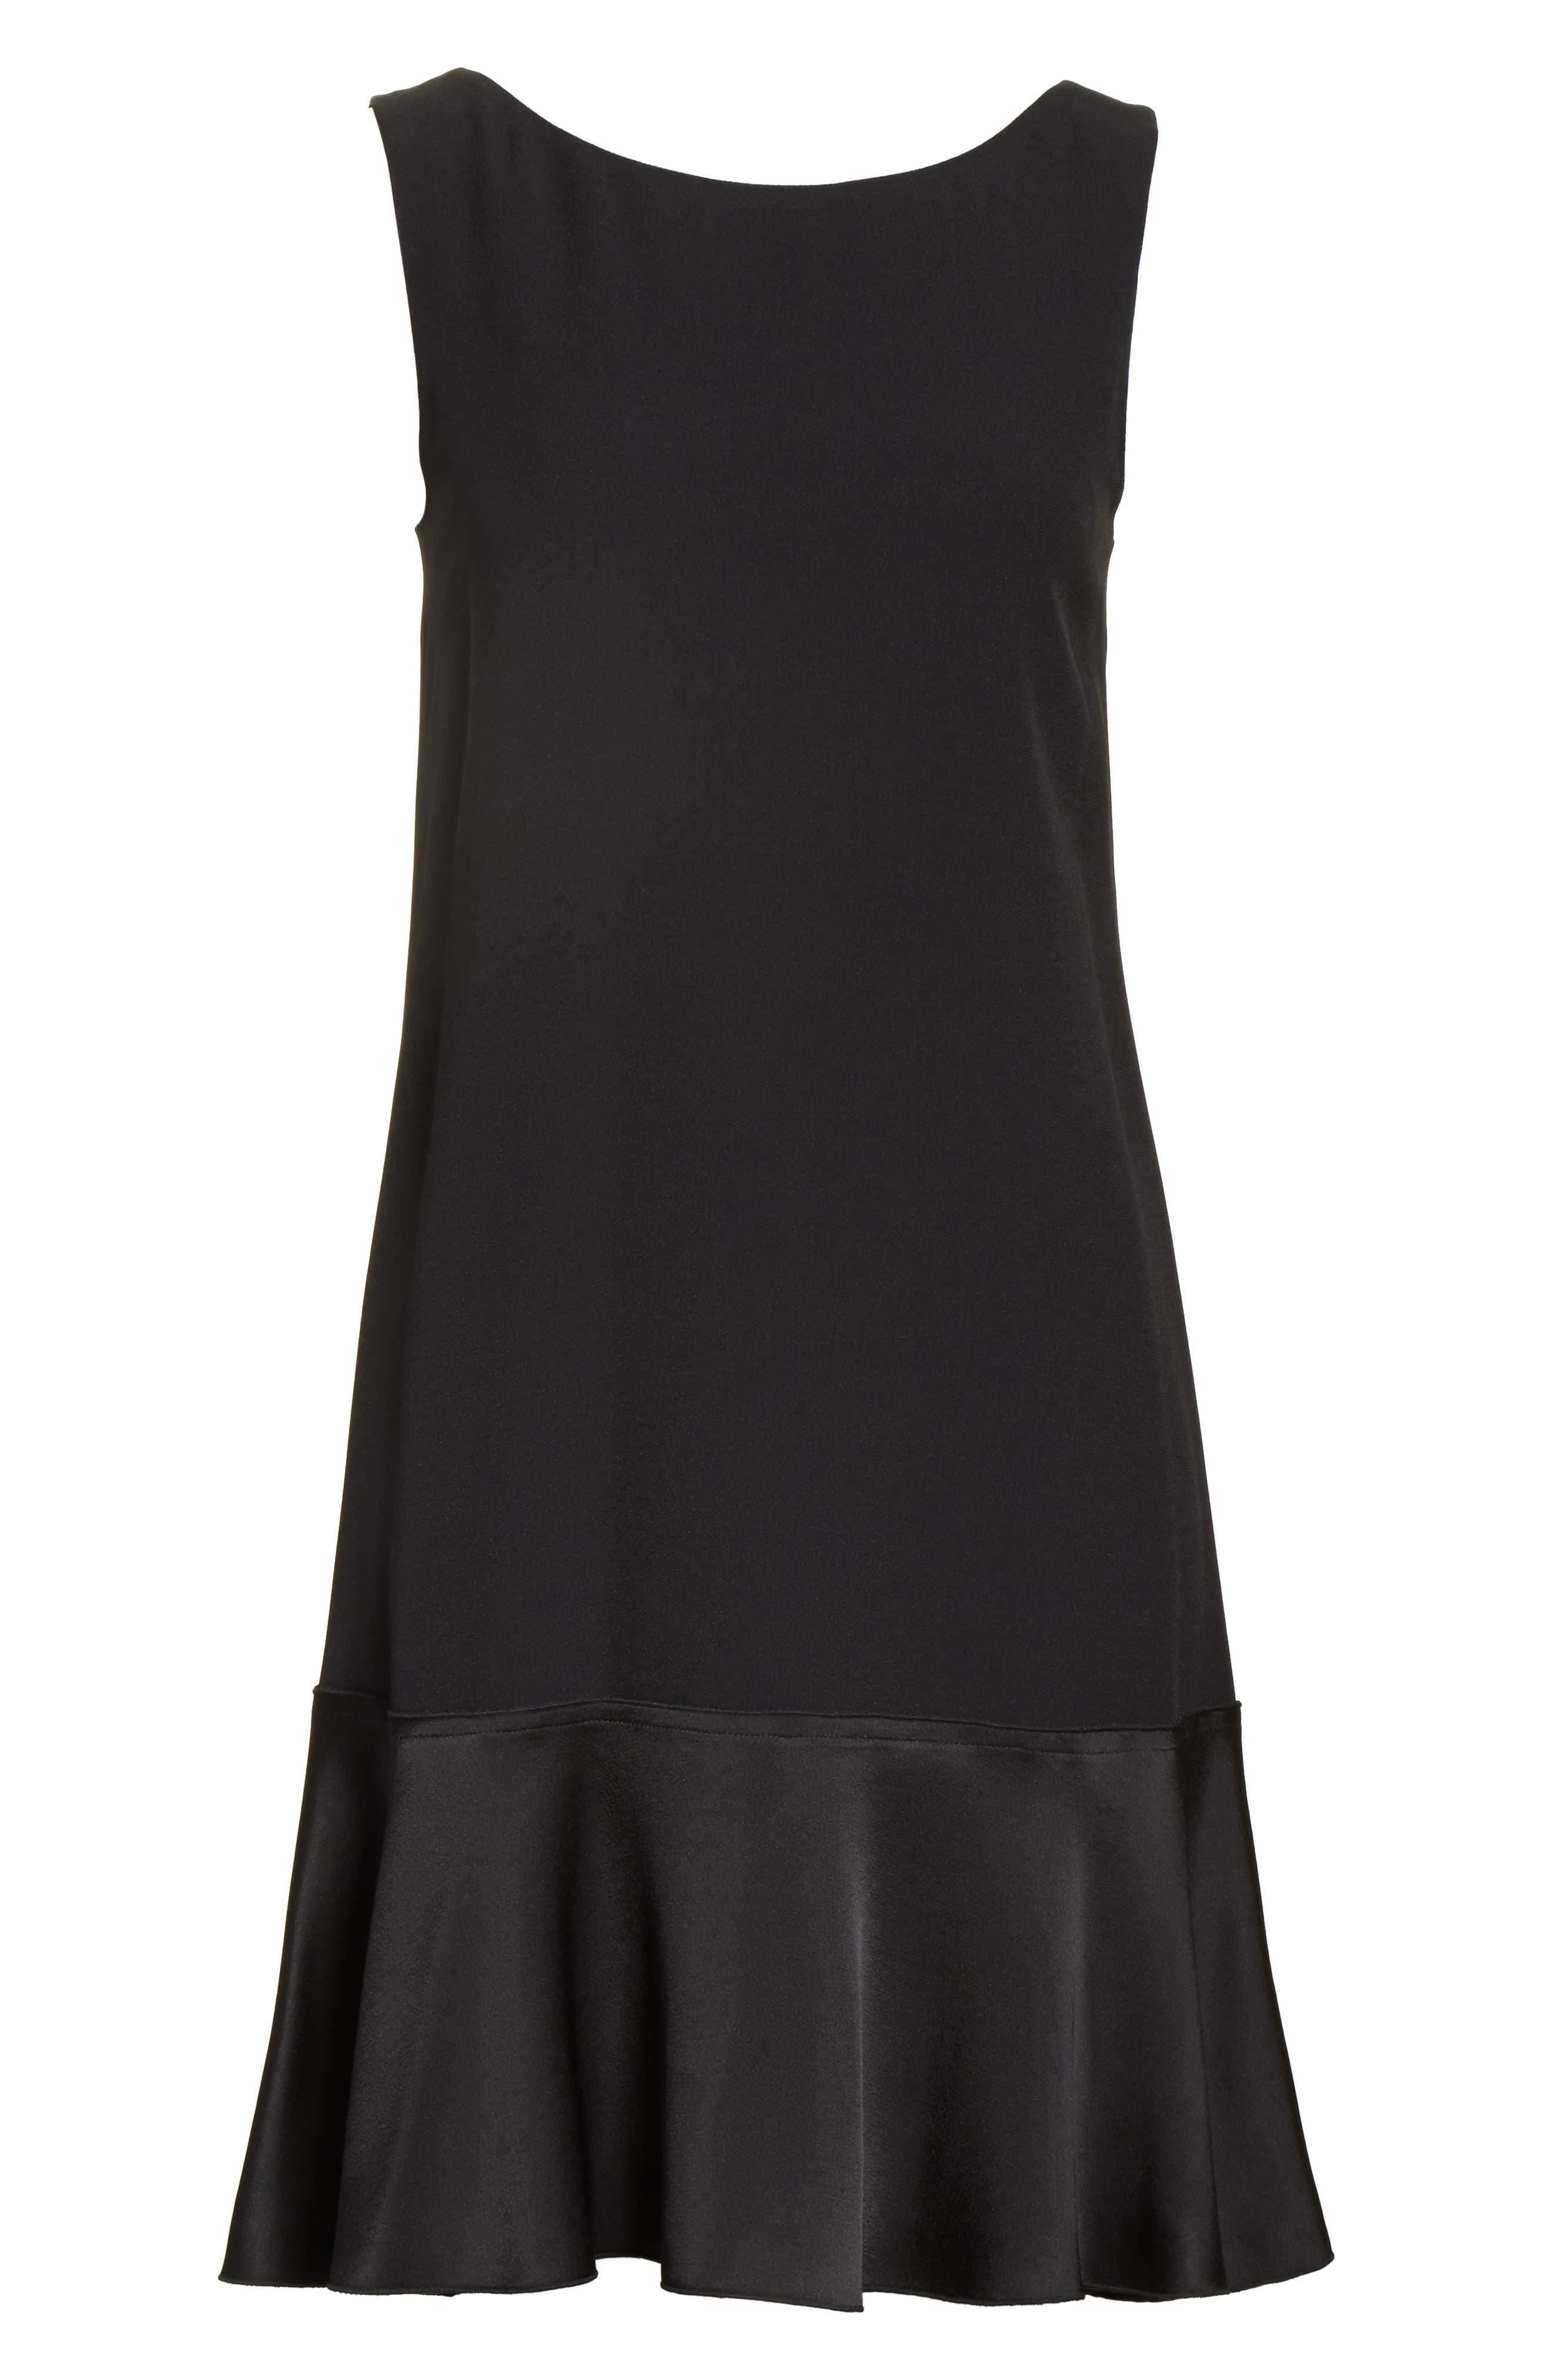 Kensington Flirty Flare Dress,                             Alternate thumbnail 6, color,                             001